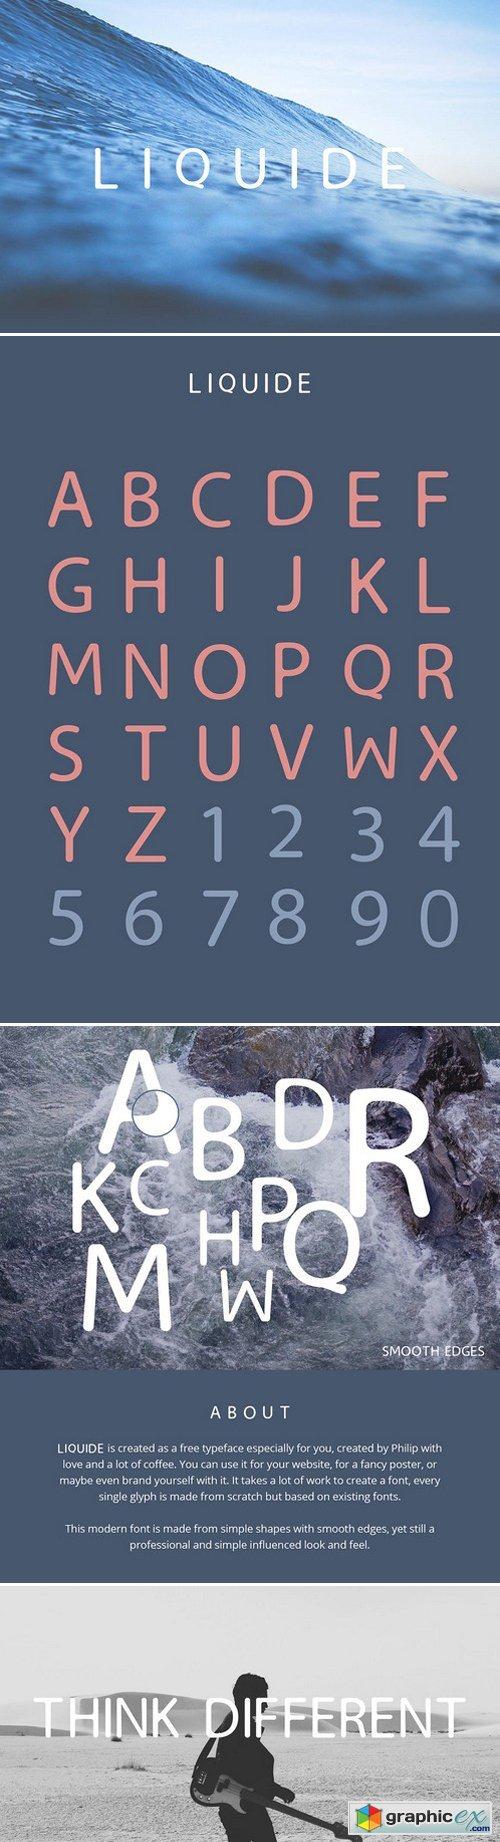 Liquide – Typeface » Free Download Vector Stock Image Photoshop Icon